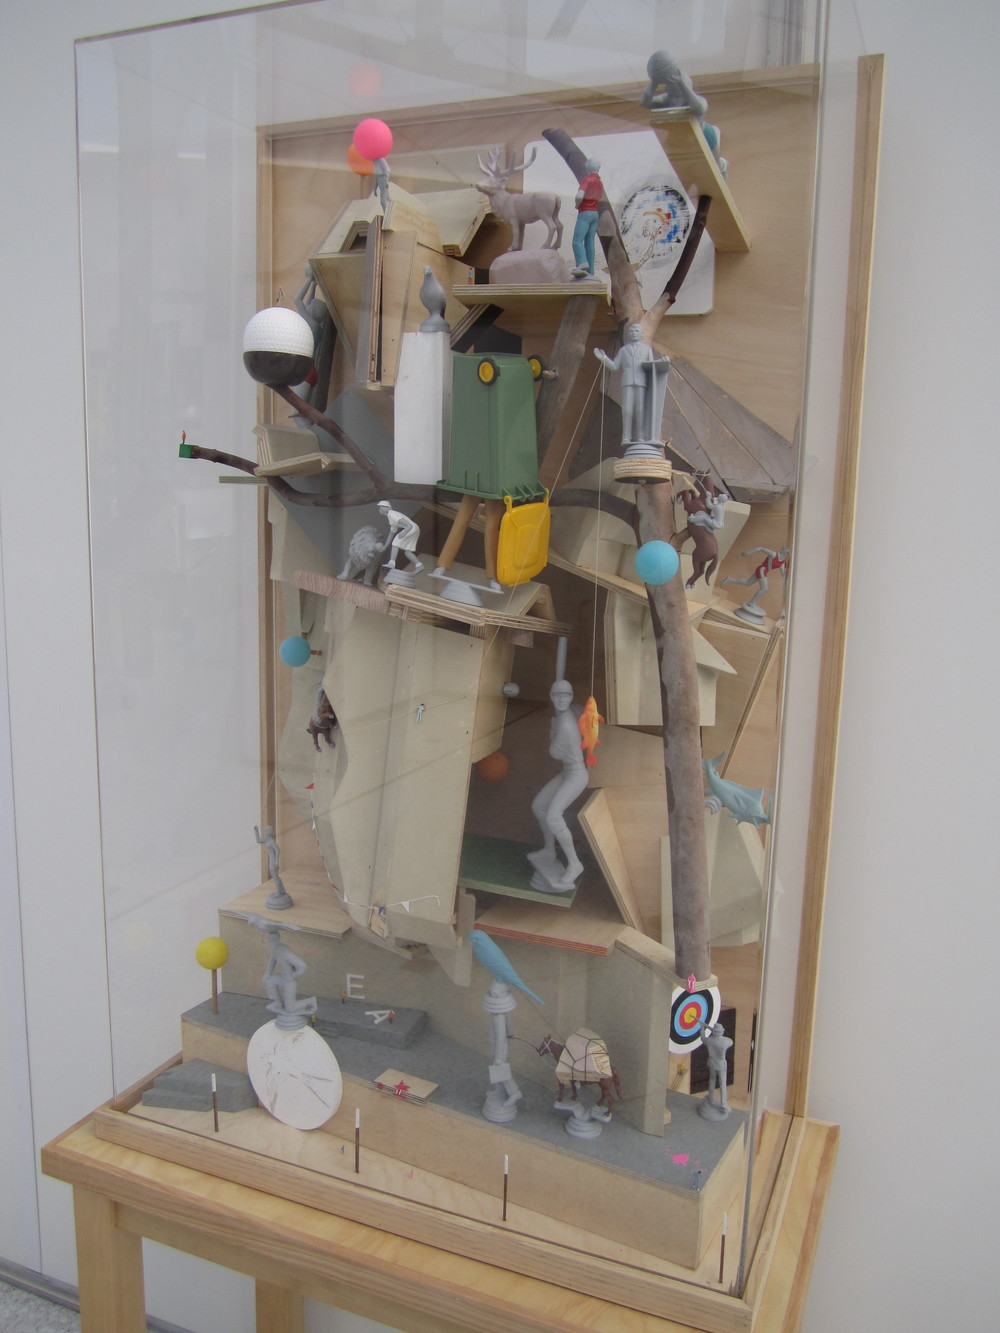 Joondalup Invitation Art Award, 2012   Precipice , 2011 Mixed media 193cm x 83cm x 44cm